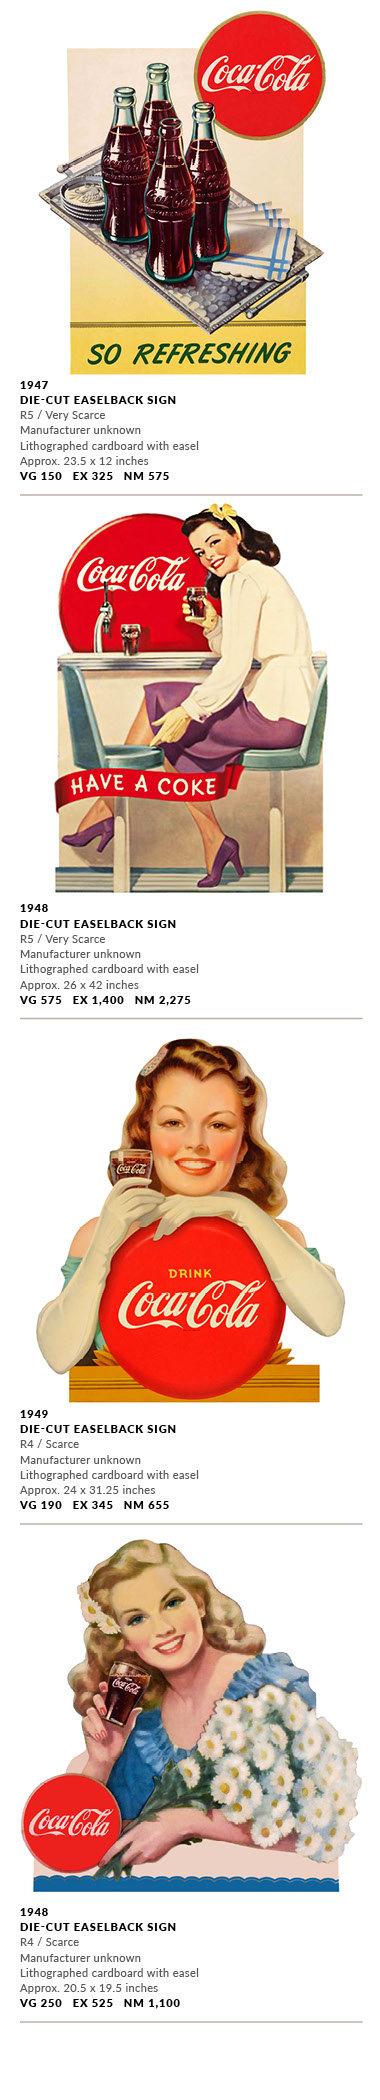 1930-1949DieCutsPHONE_14.jpg